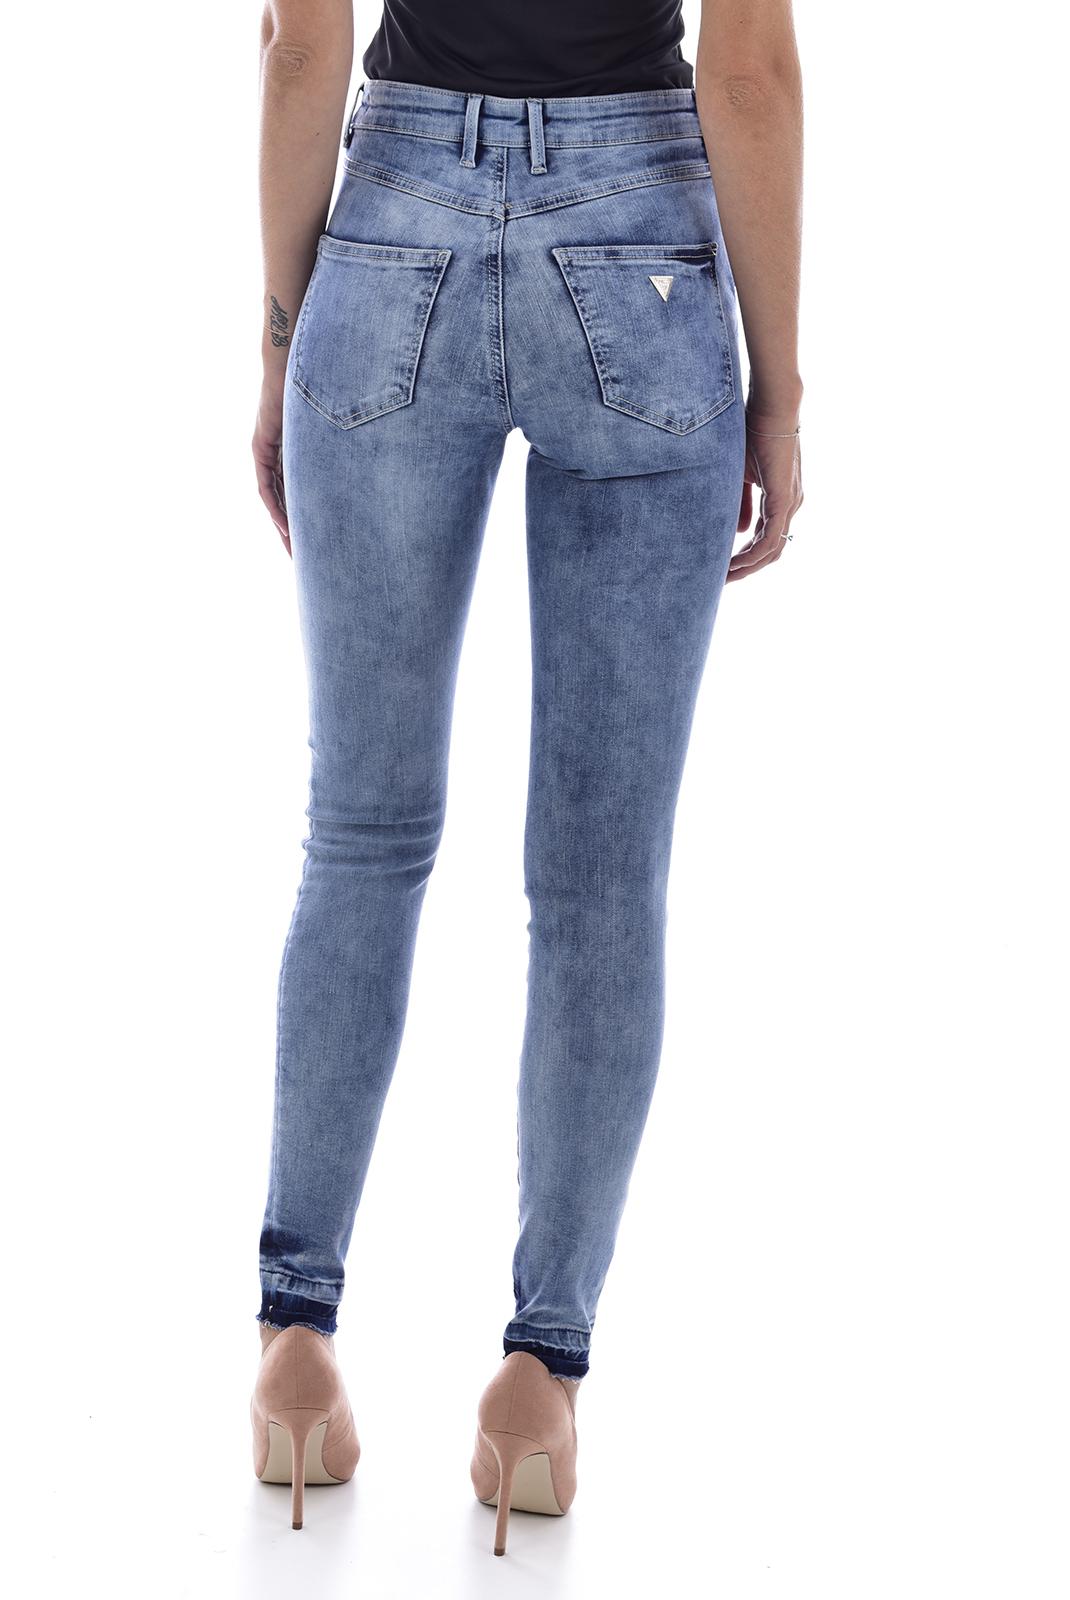 Femme  Guess jeans W81A28D2ZD0 1981 CONEY WASH